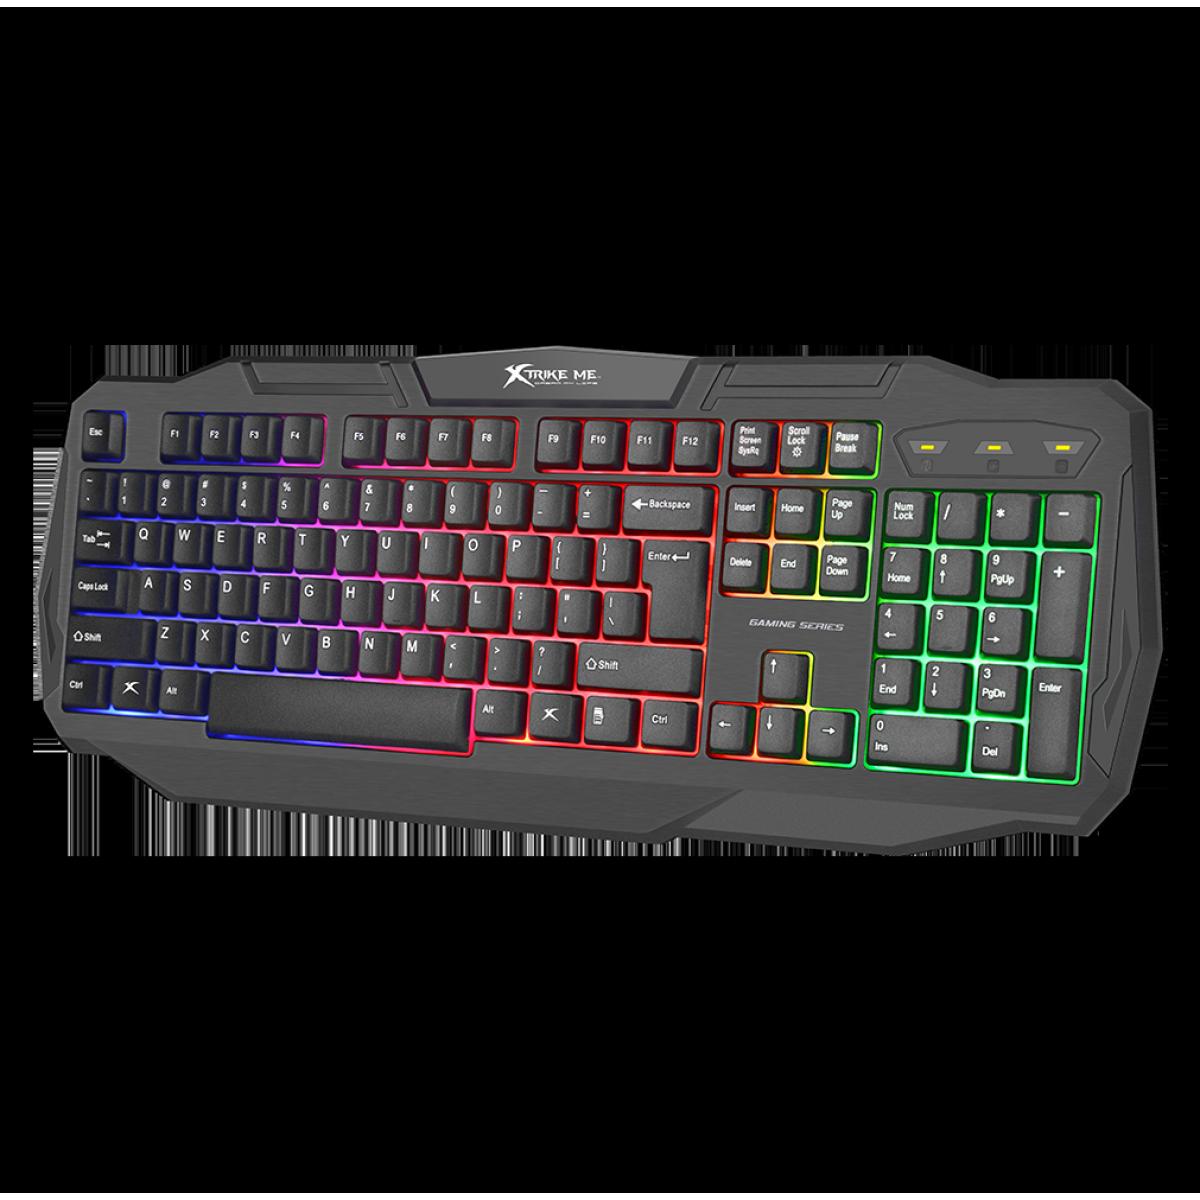 Teclado Membrana XTRIKE-ME KB-302, RGB, backlight, Inglês, Black, KB302BK